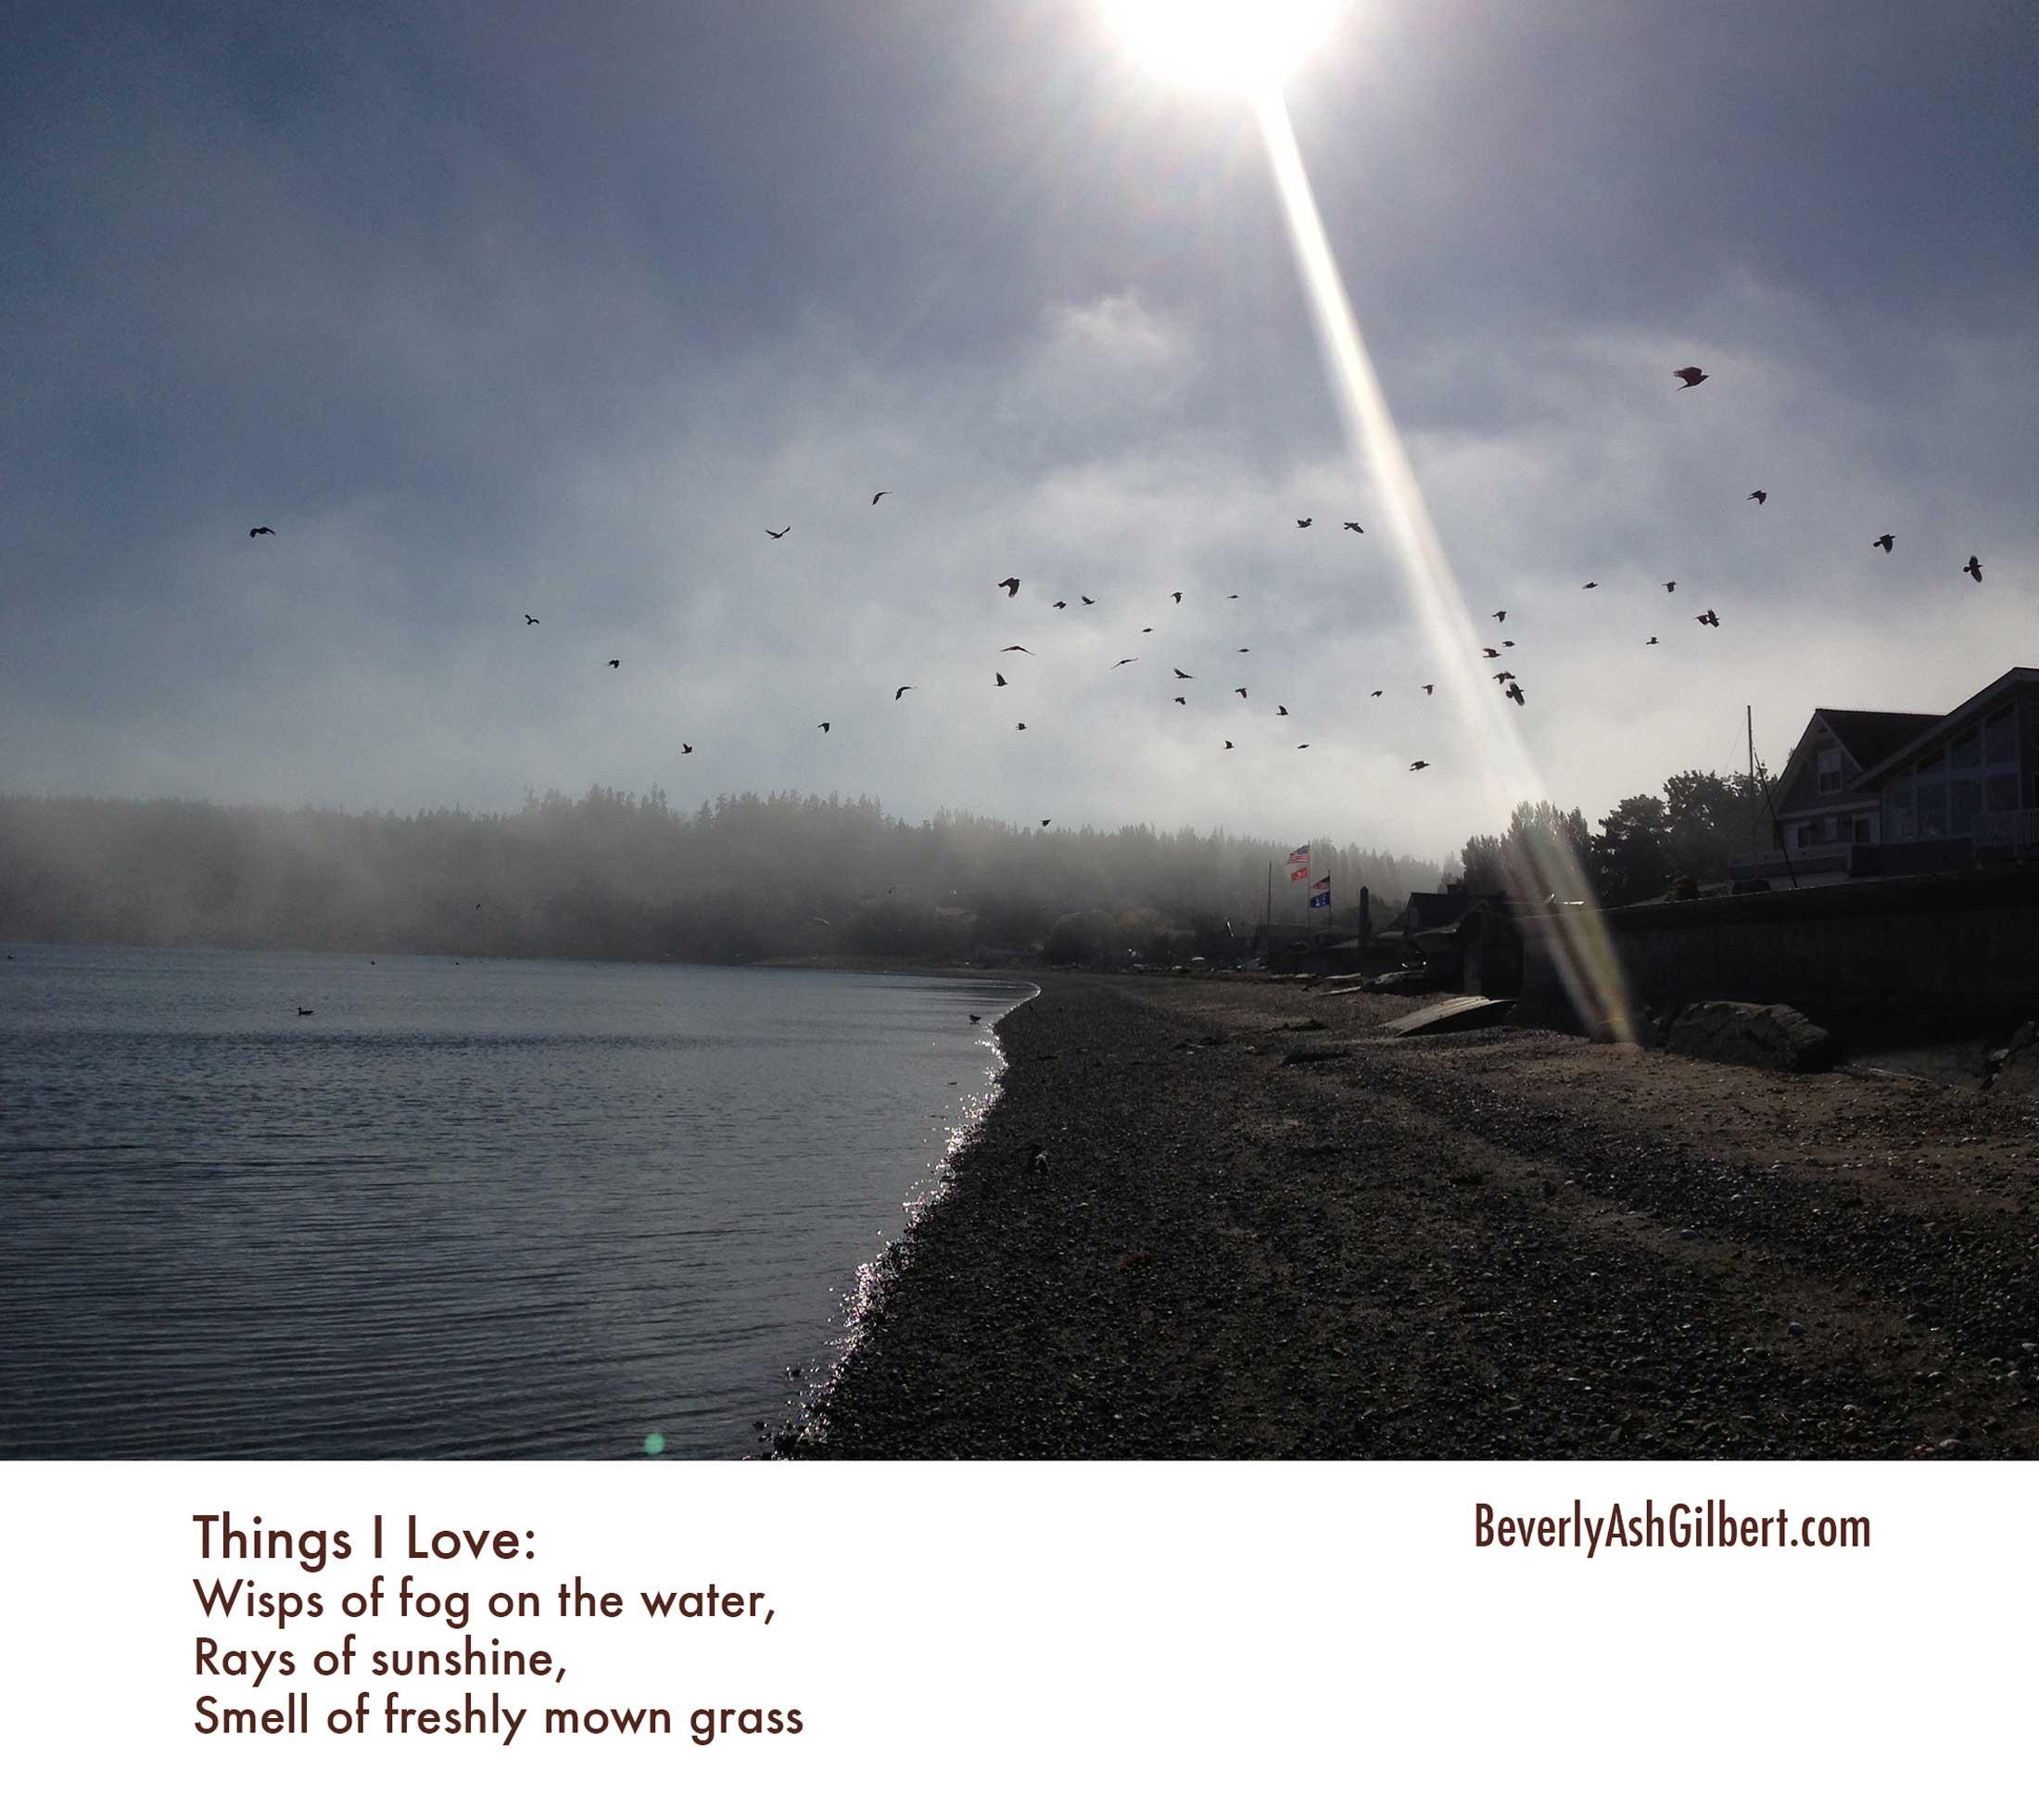 ThingsILove_Wisps_of_Fog.jpg